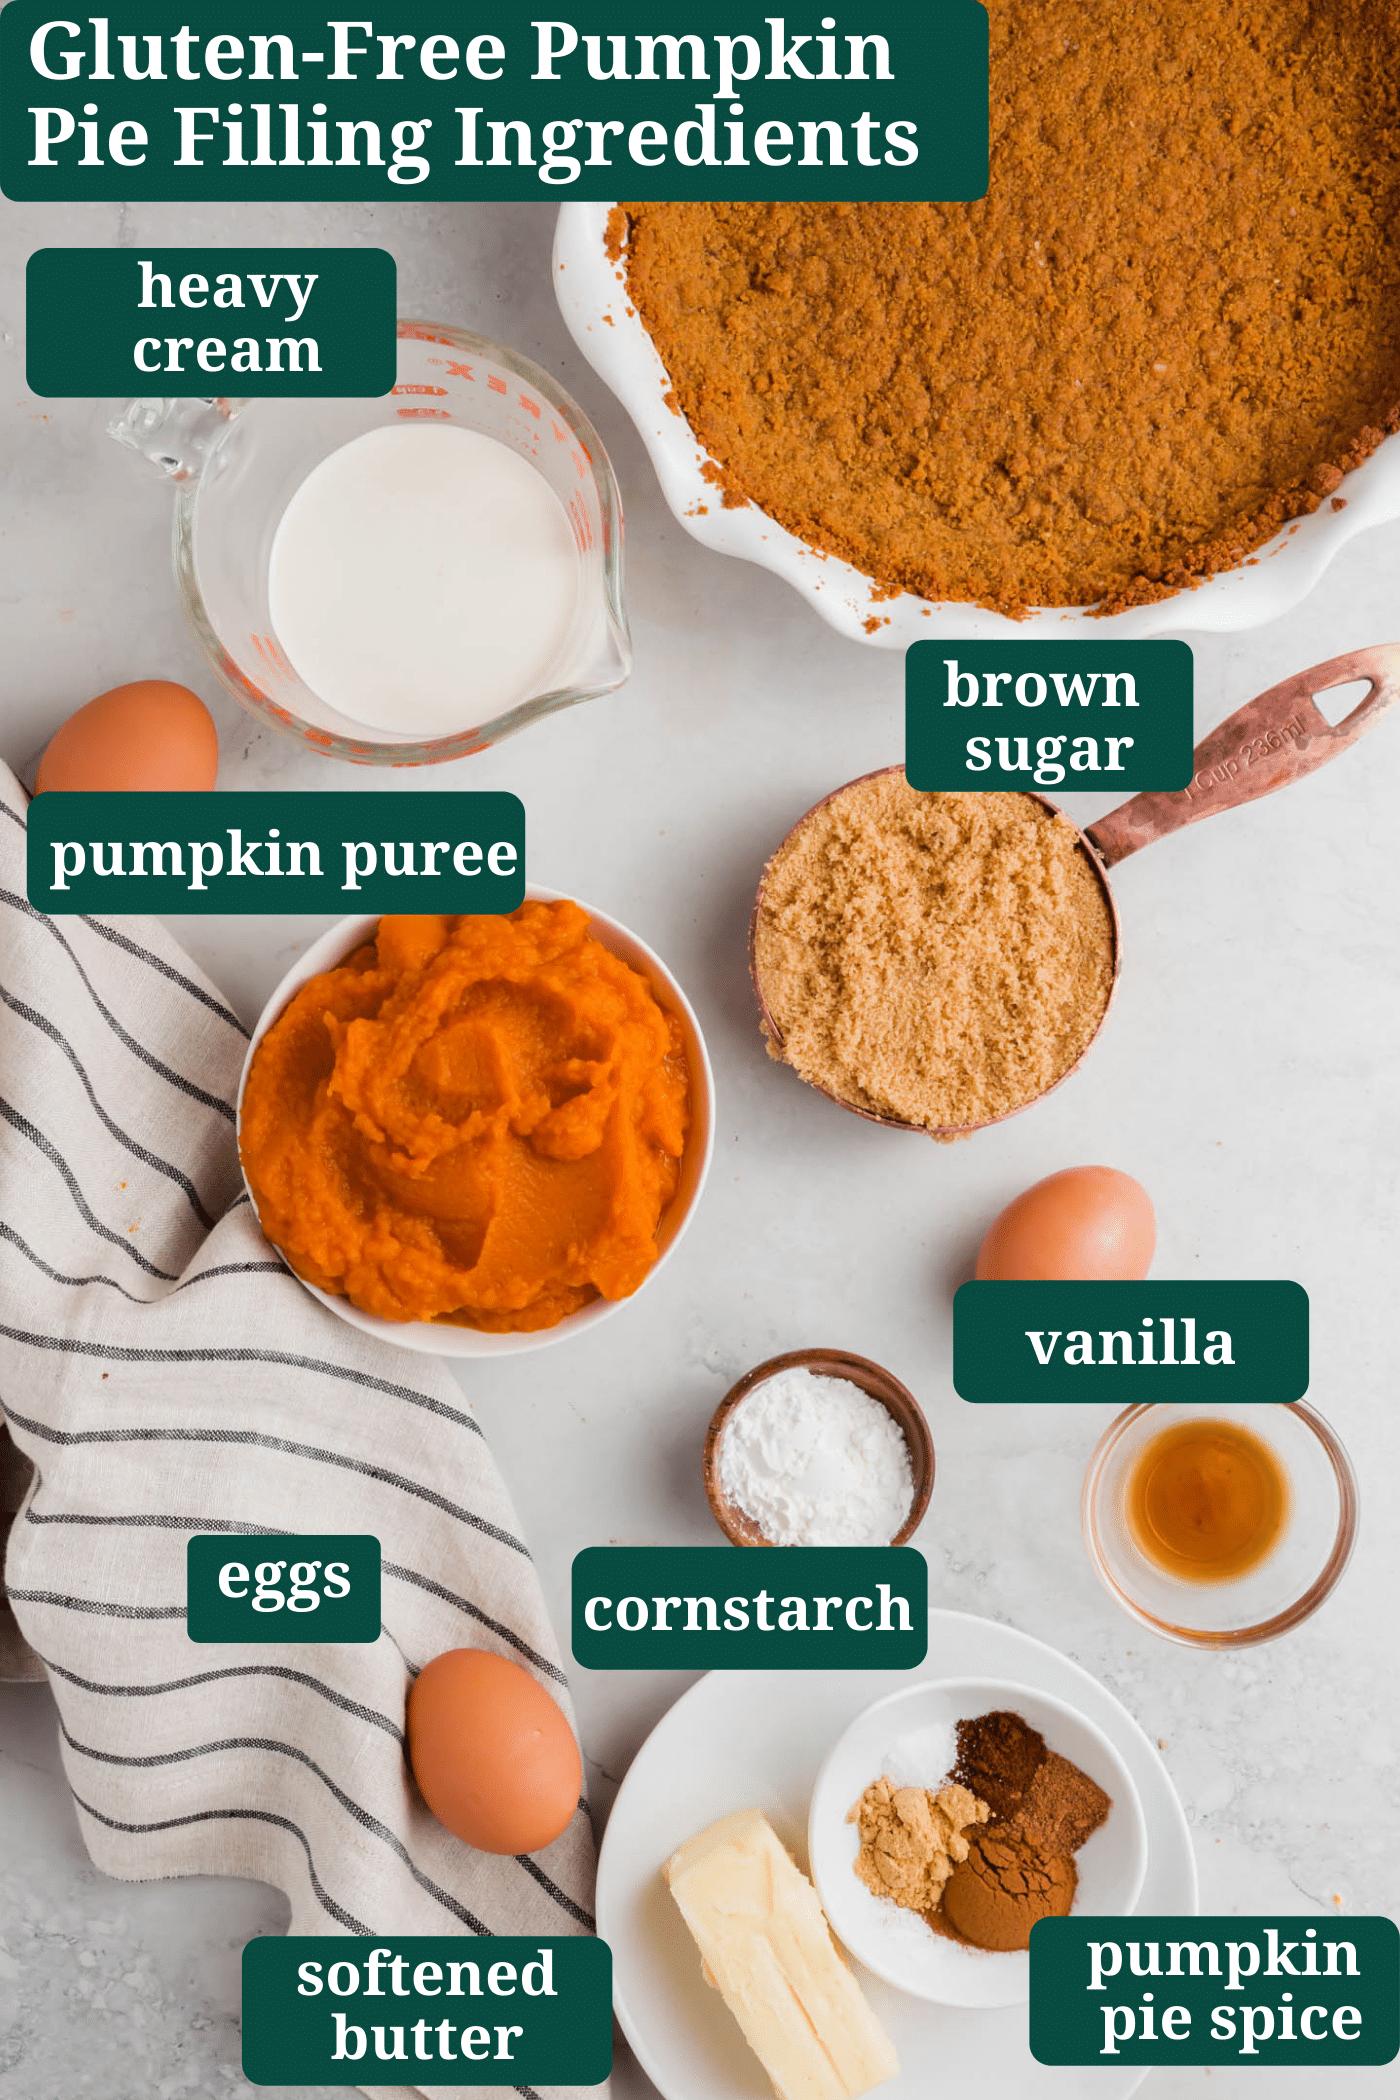 An overhead photo of ingredients for making gluten-free pumpkin pie filling.